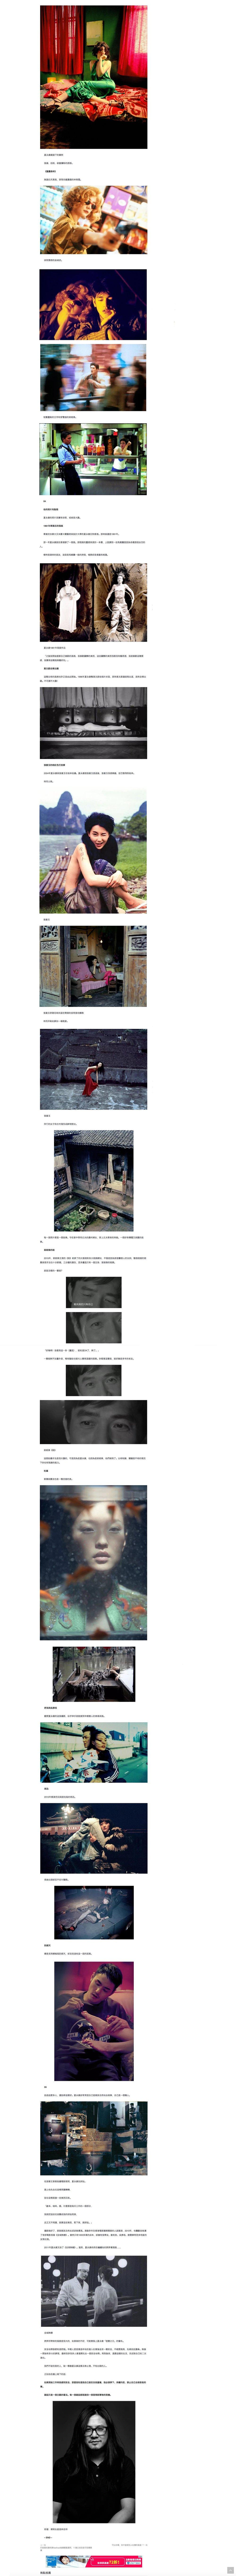 xcnnews 中國新聞 p2.jpg